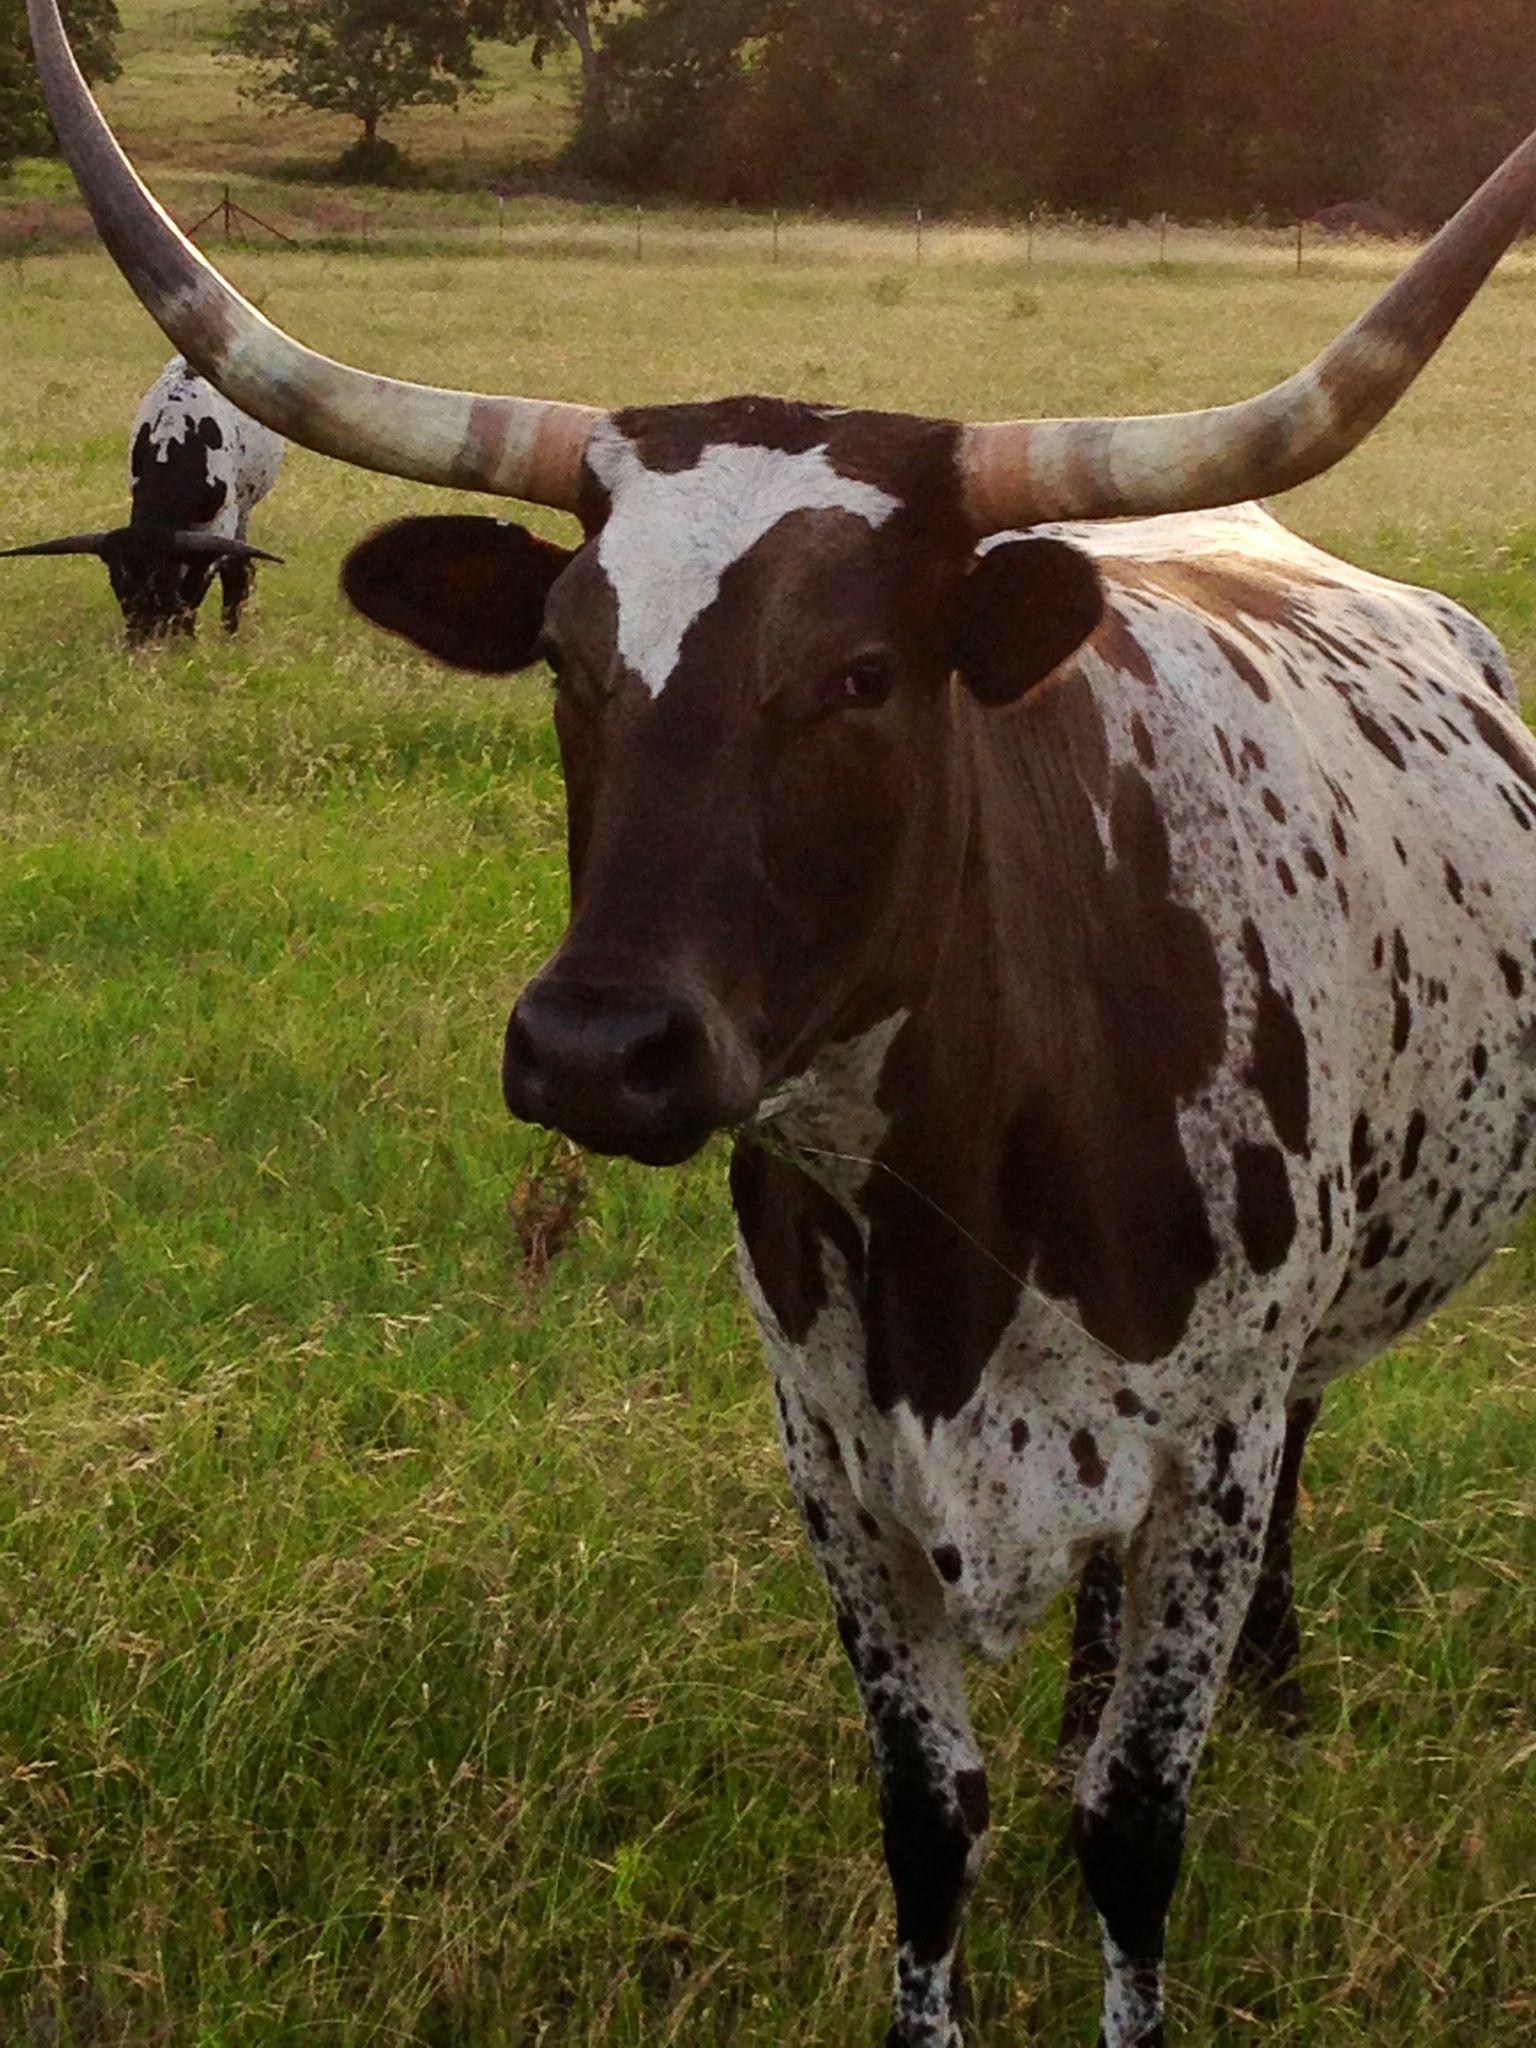 Abracadabra Longhorn, Africa fashion, Animals